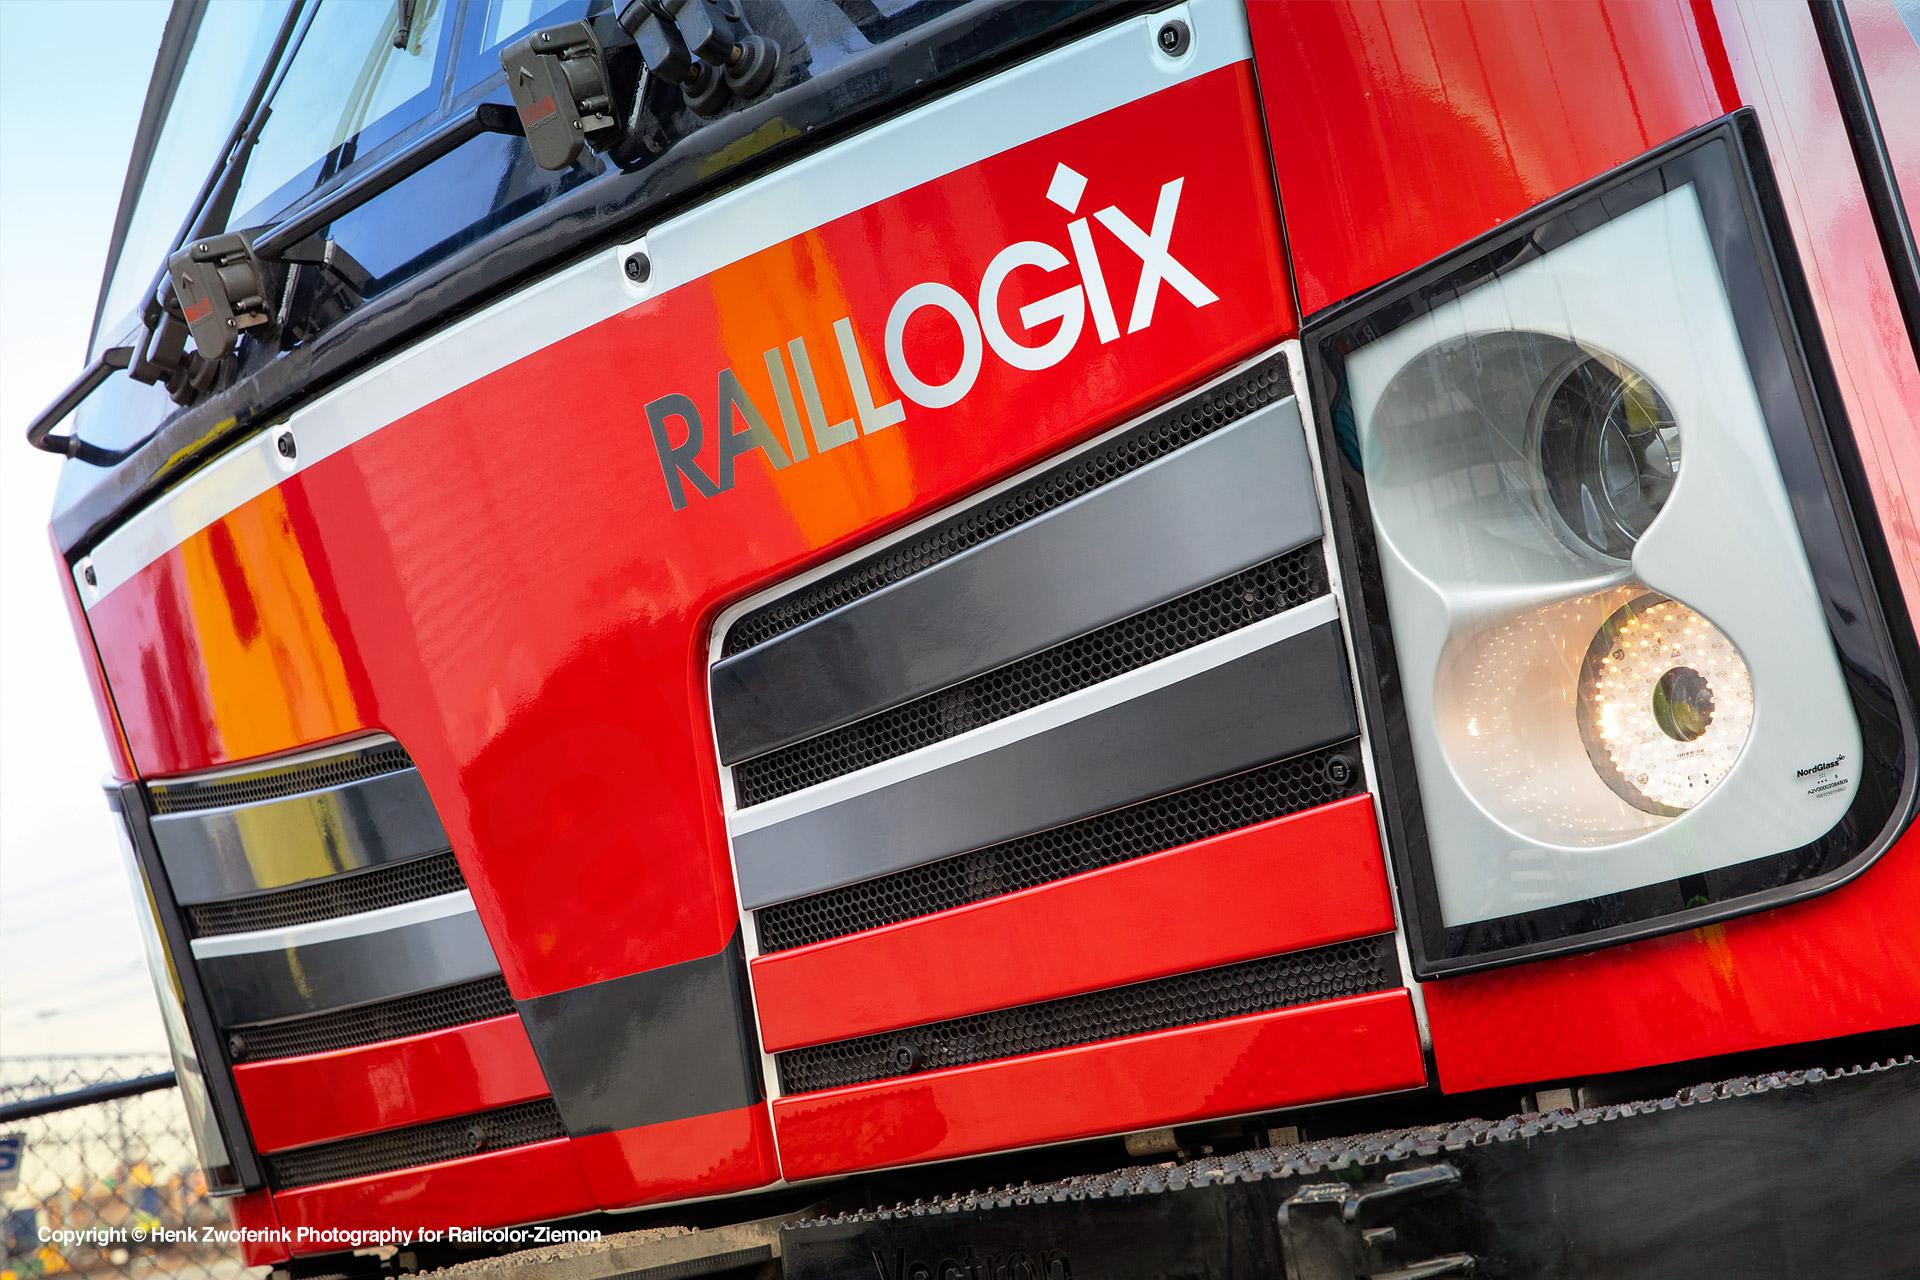 railcolordesign-ip-raillogixruby-006